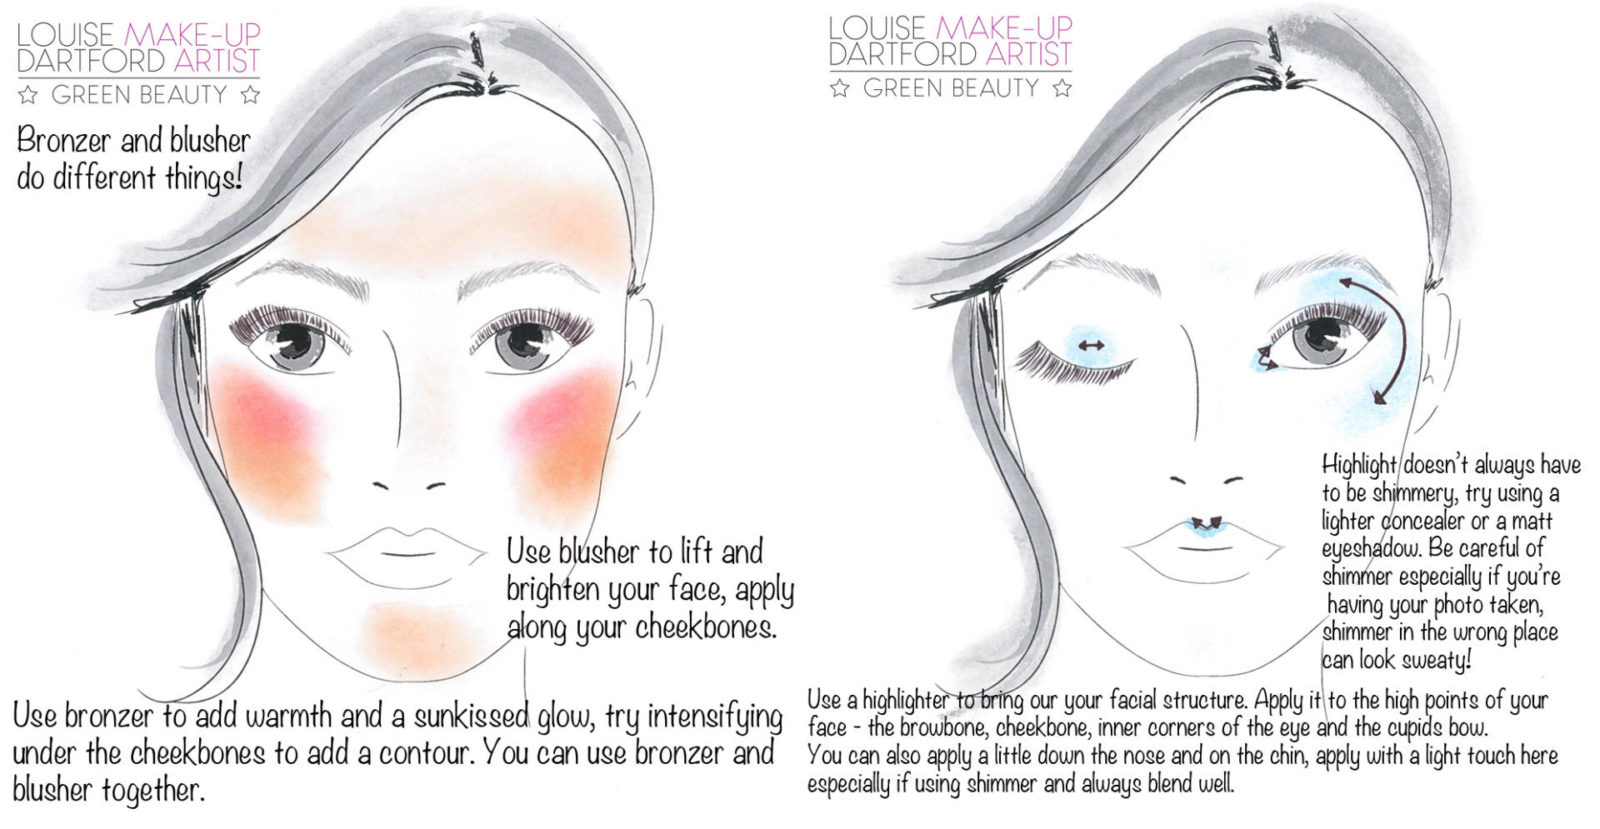 August's Instagram make-up tips..